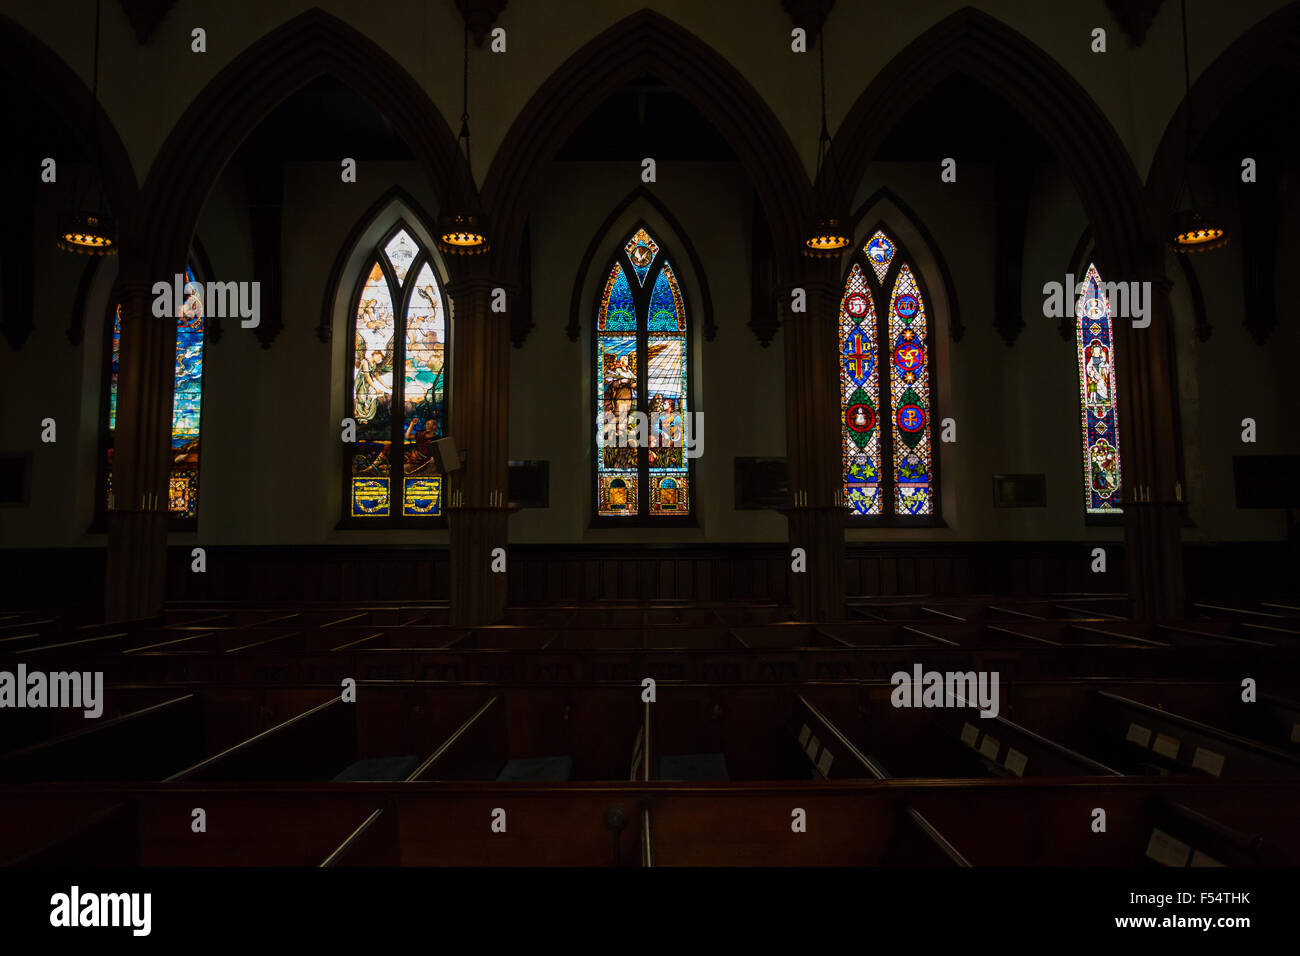 church interior stain glass windows - Stock Image